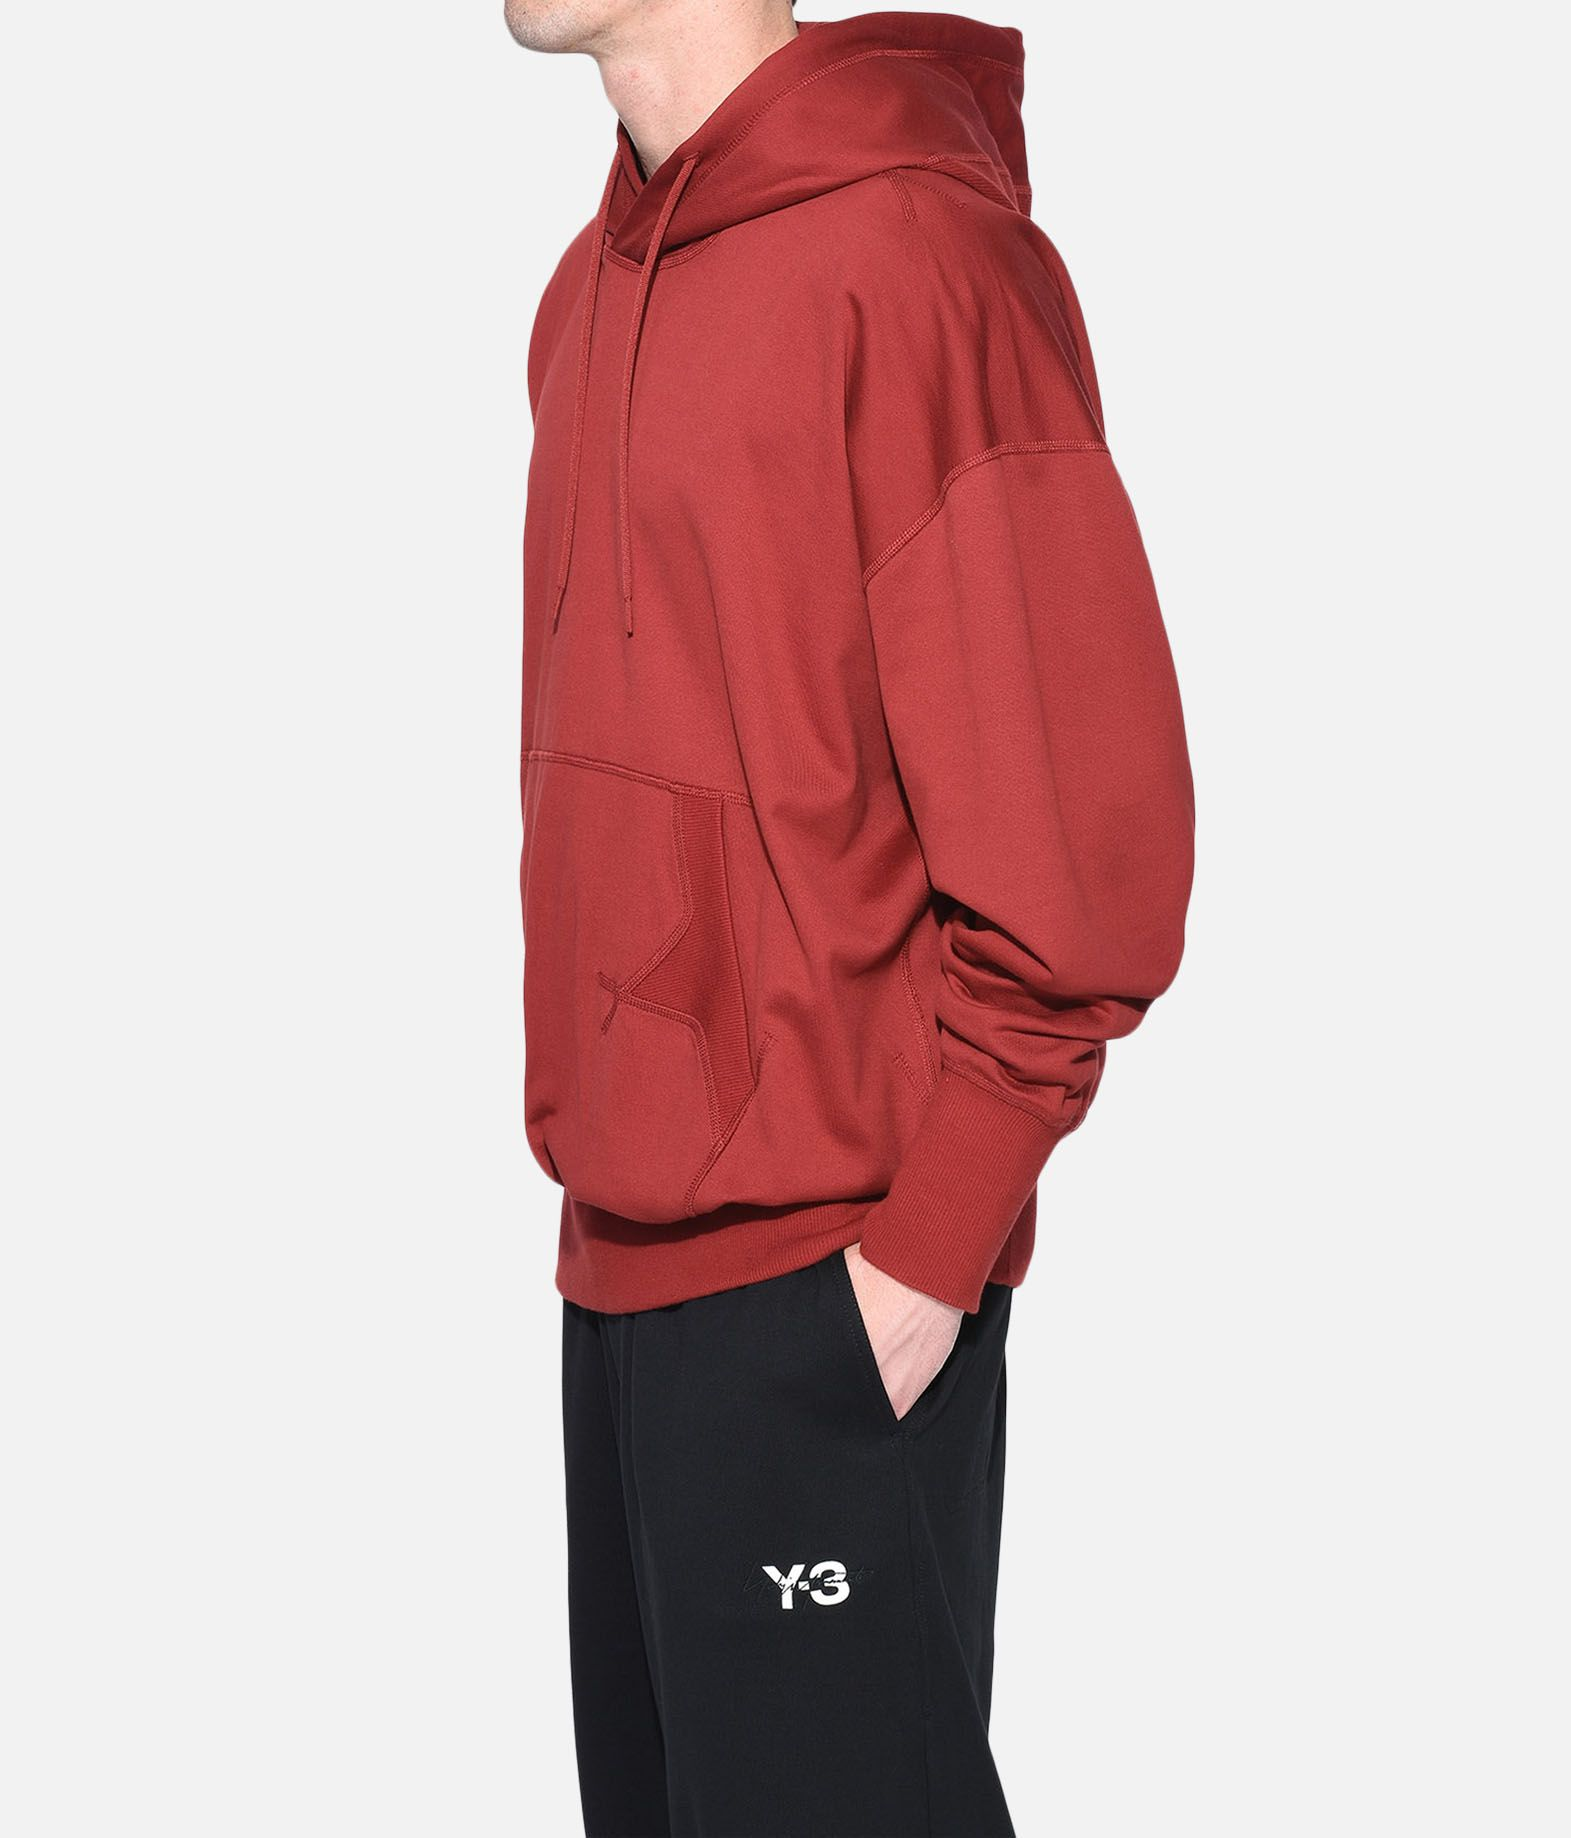 Y-3 Y-3 Stacked Logo Hoodie フード付きトレーナー メンズ e